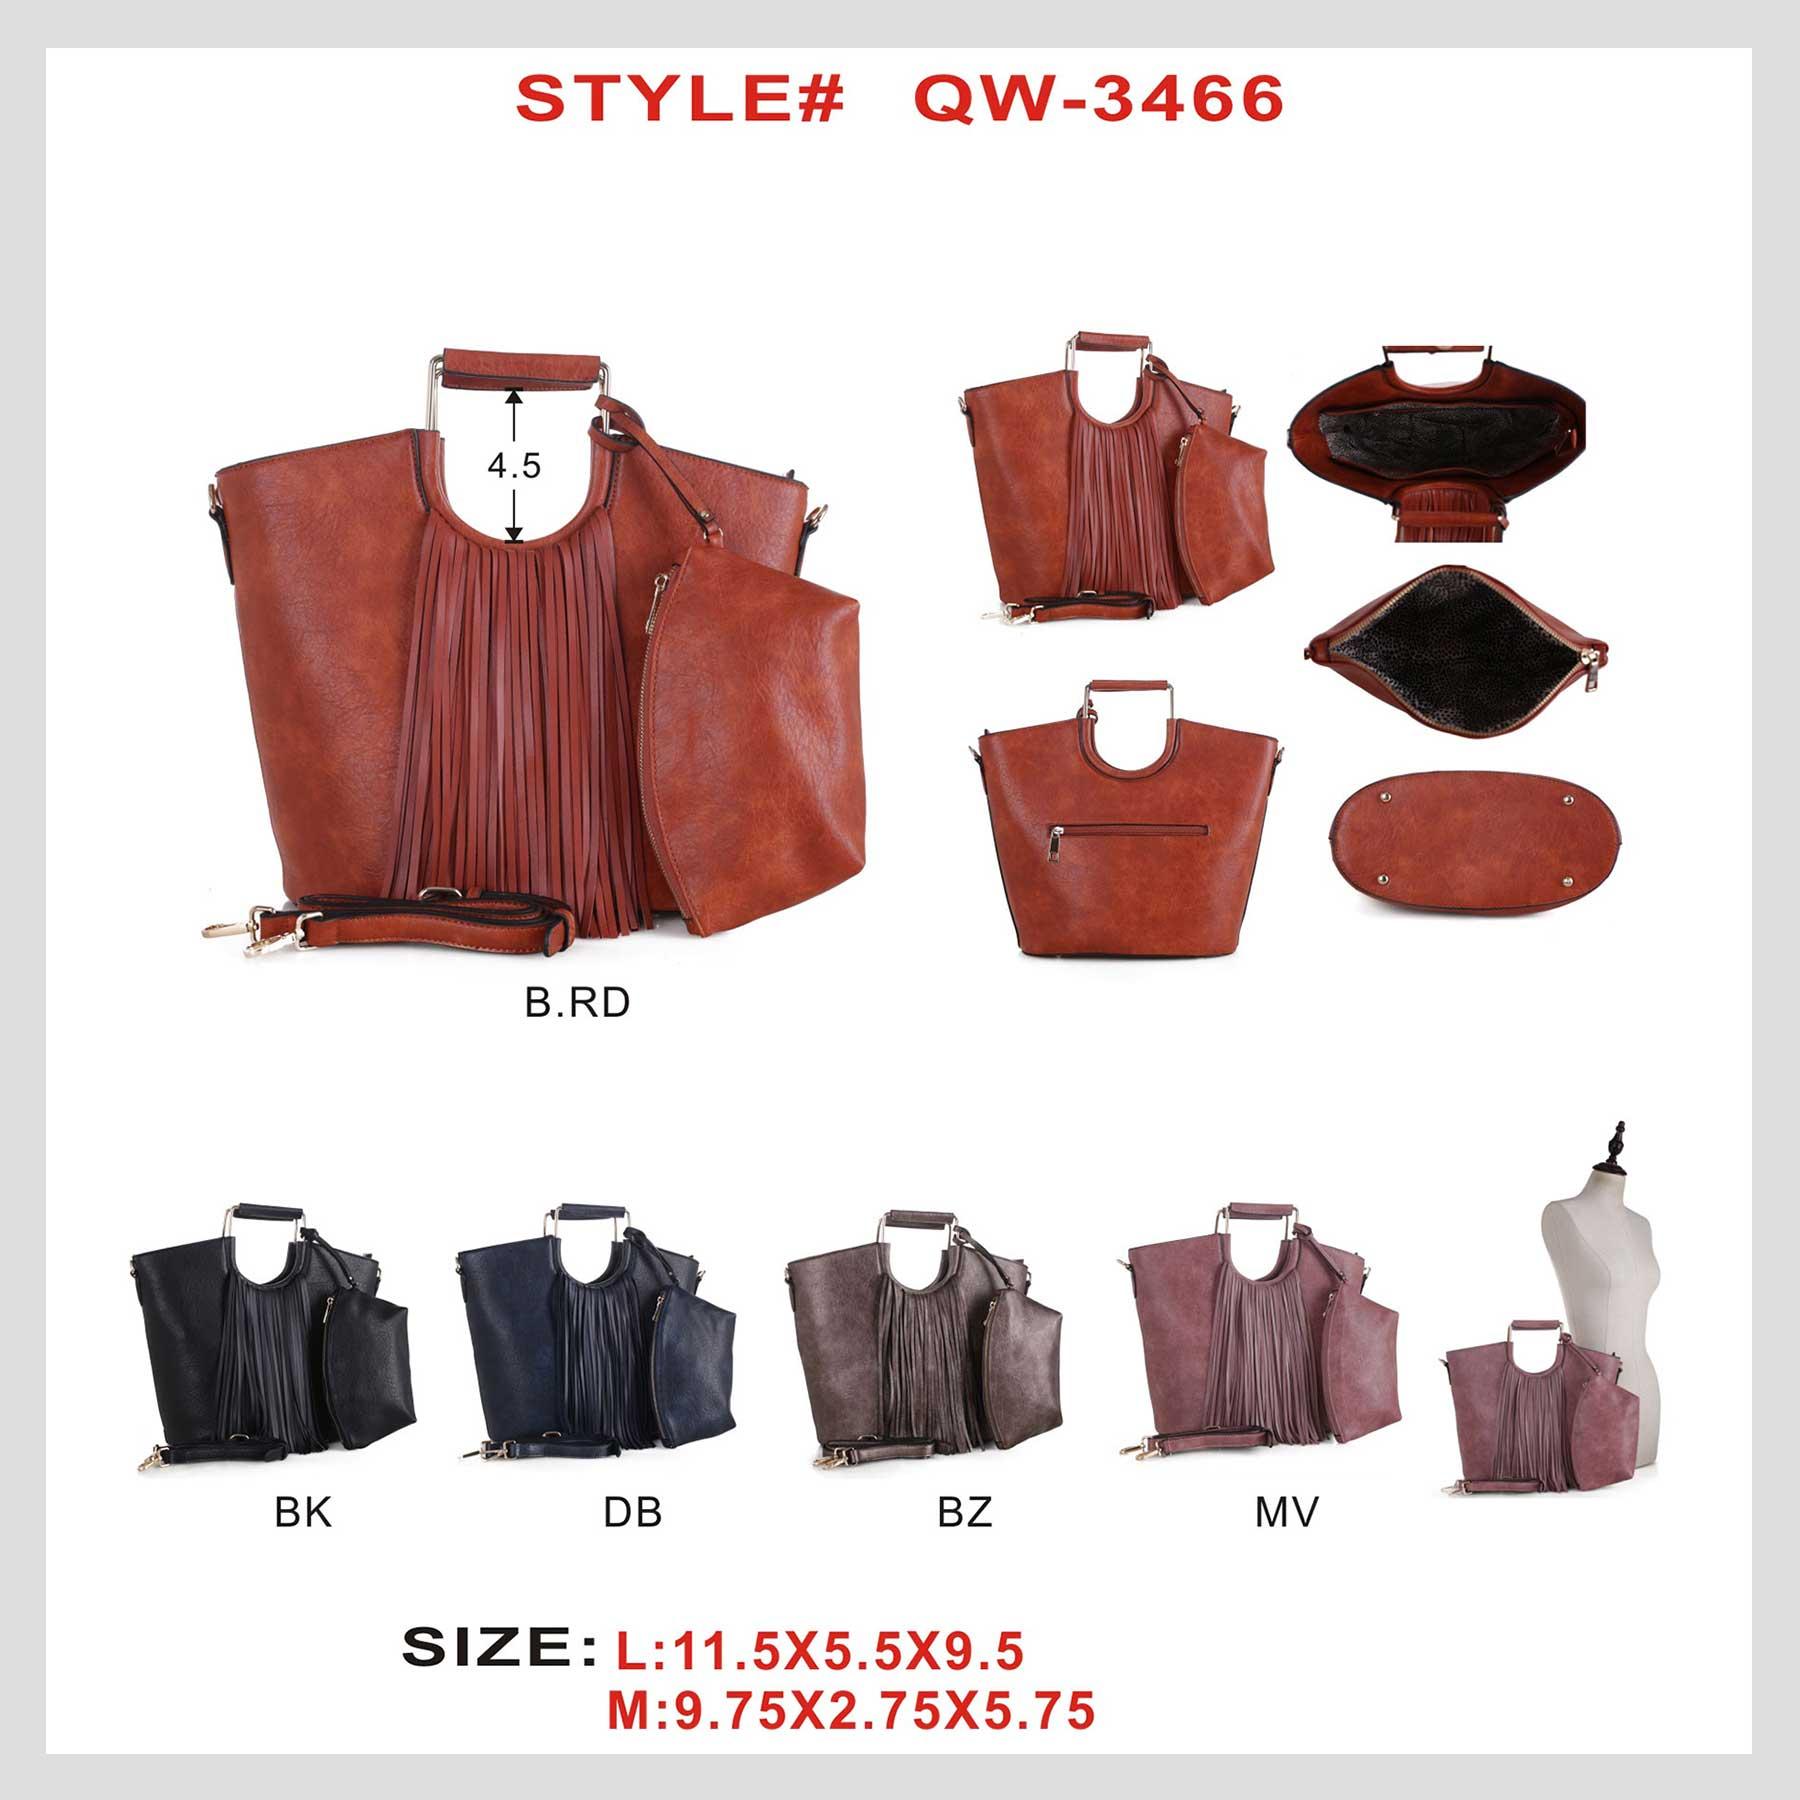 QW-3466.jpg